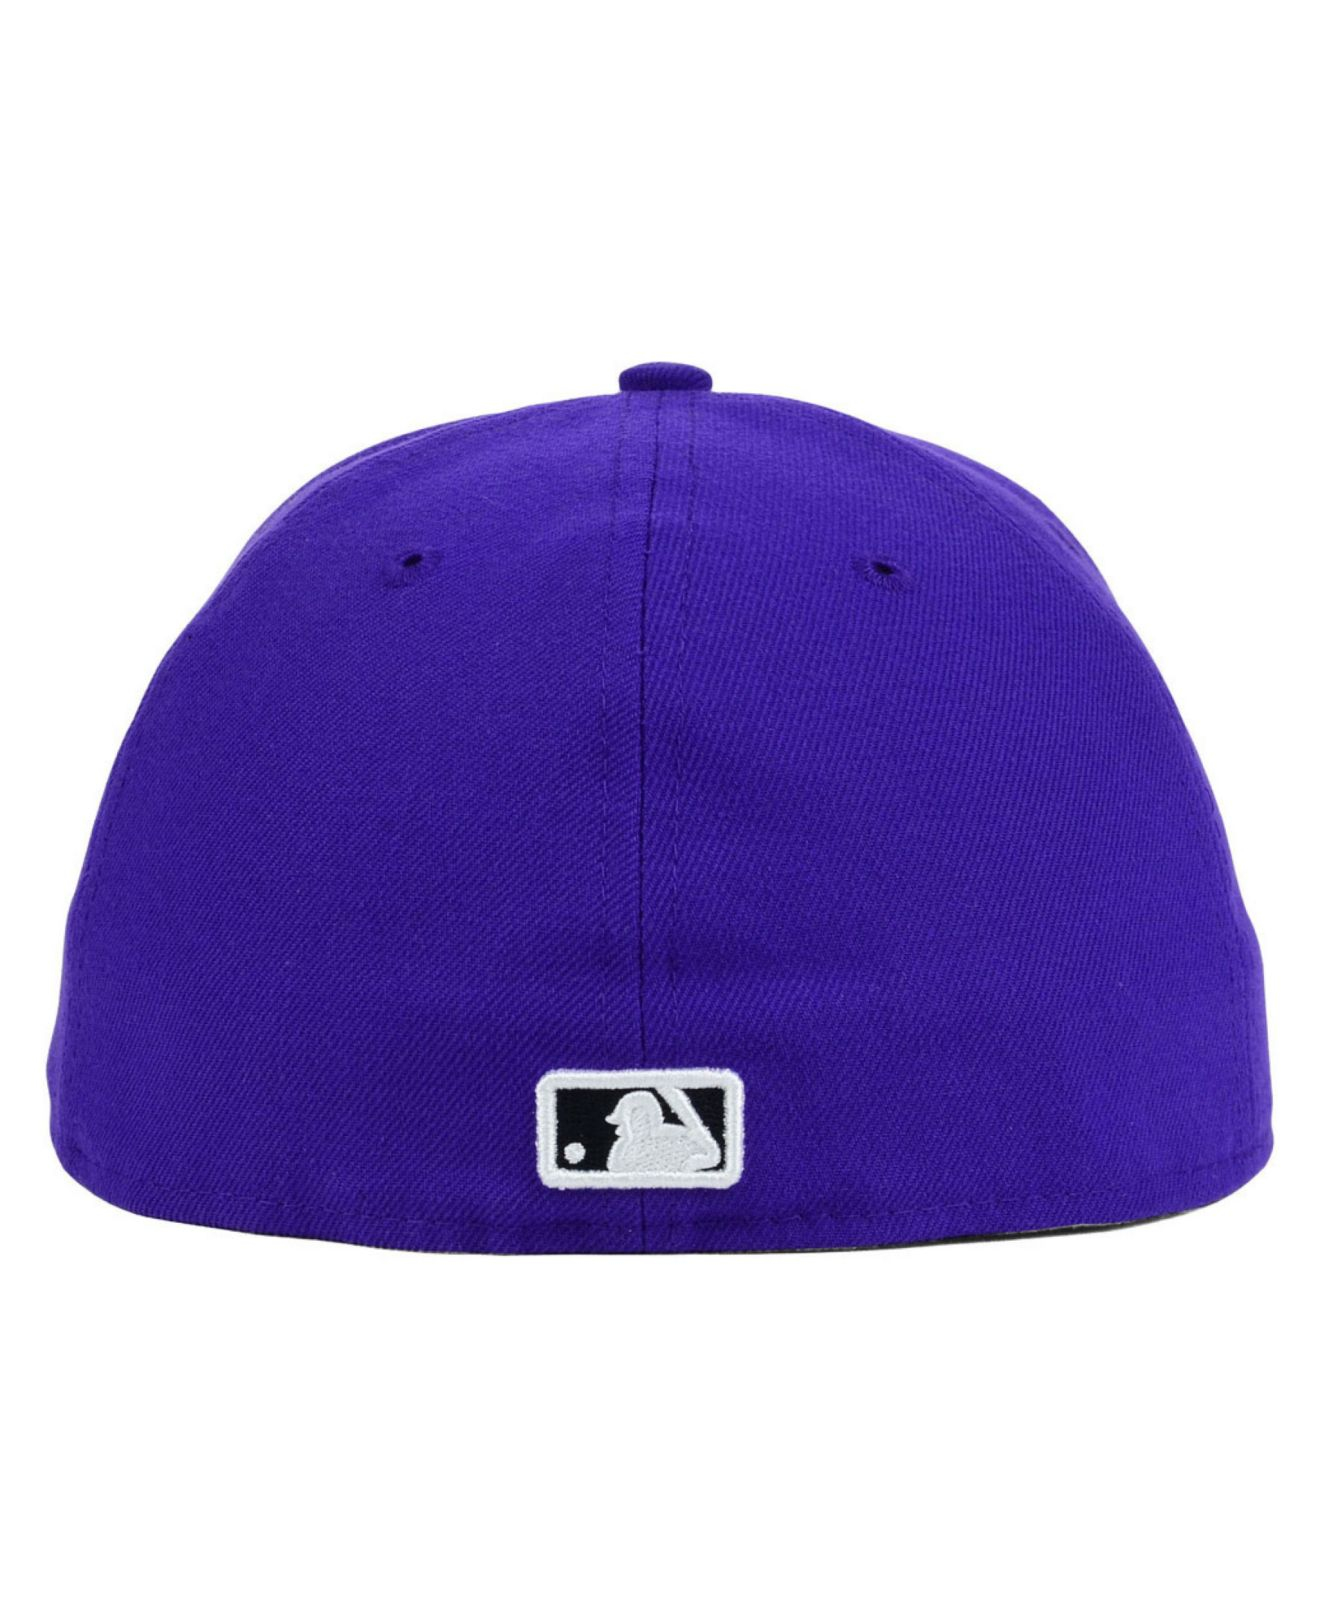 ... sale lyst ktz kansas city royals c dub 59fifty cap in purple 7eda3 50e99 3db4f3a9c88